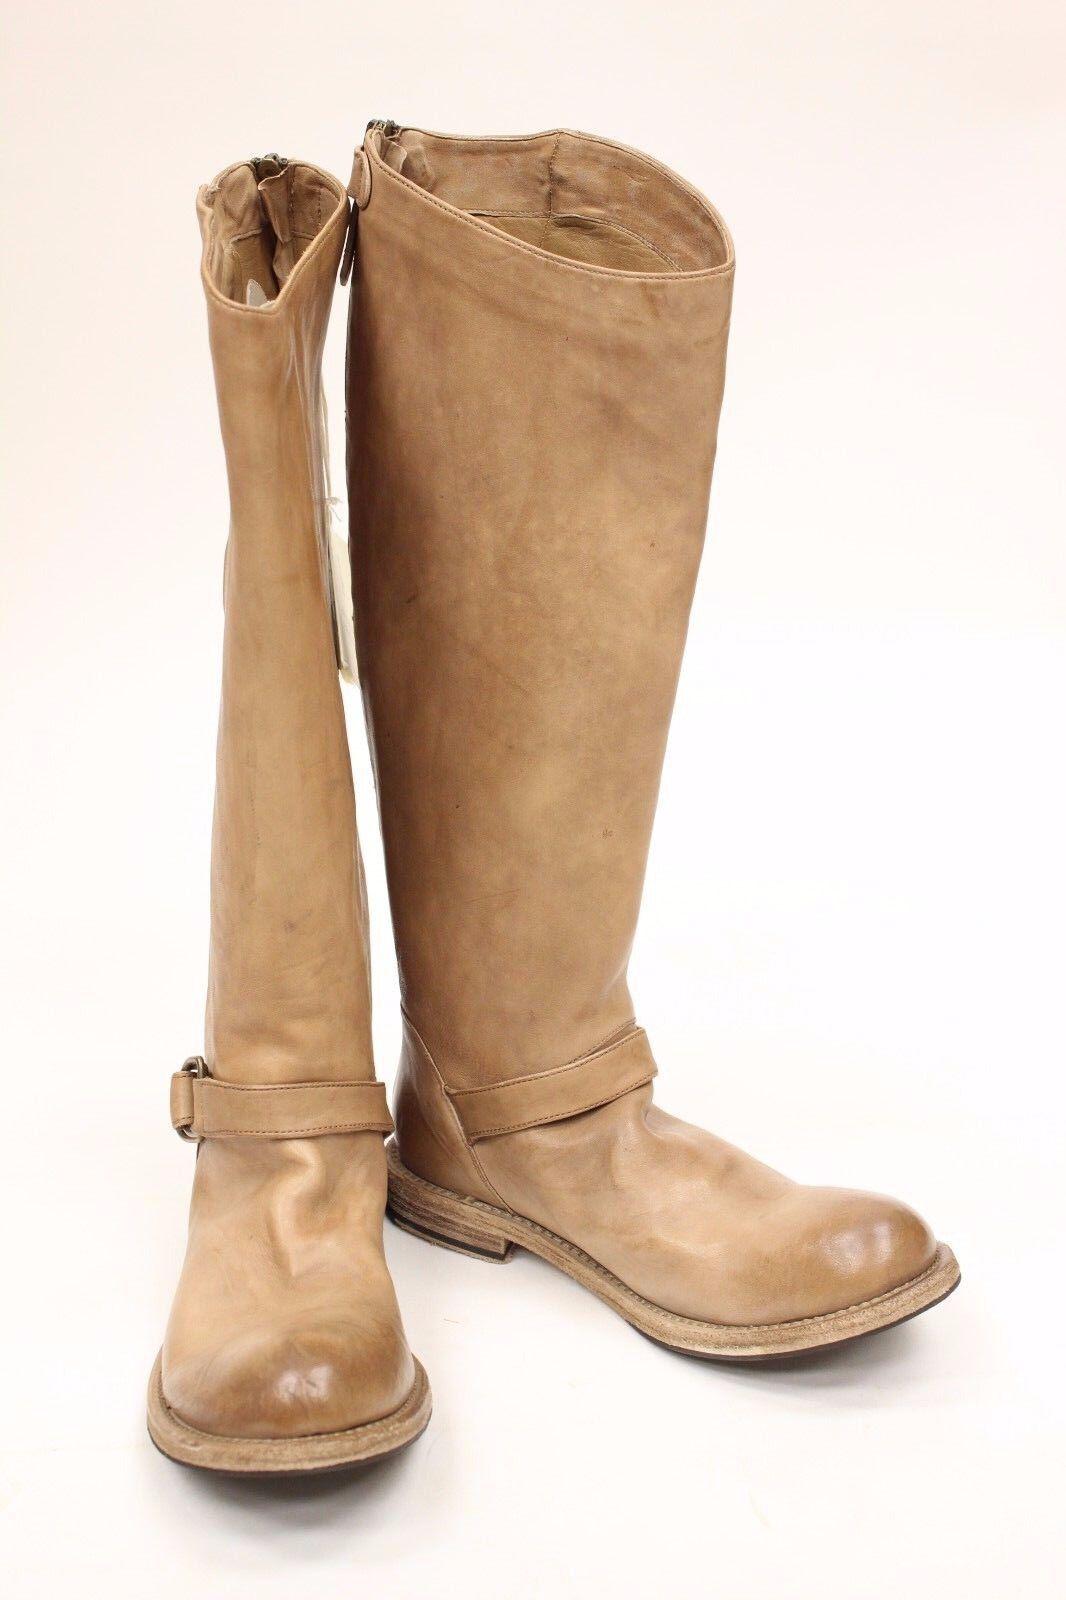 BRUNELLO CUCINELLI marron fashion bottes Taille 10 ITALY 40 NEW